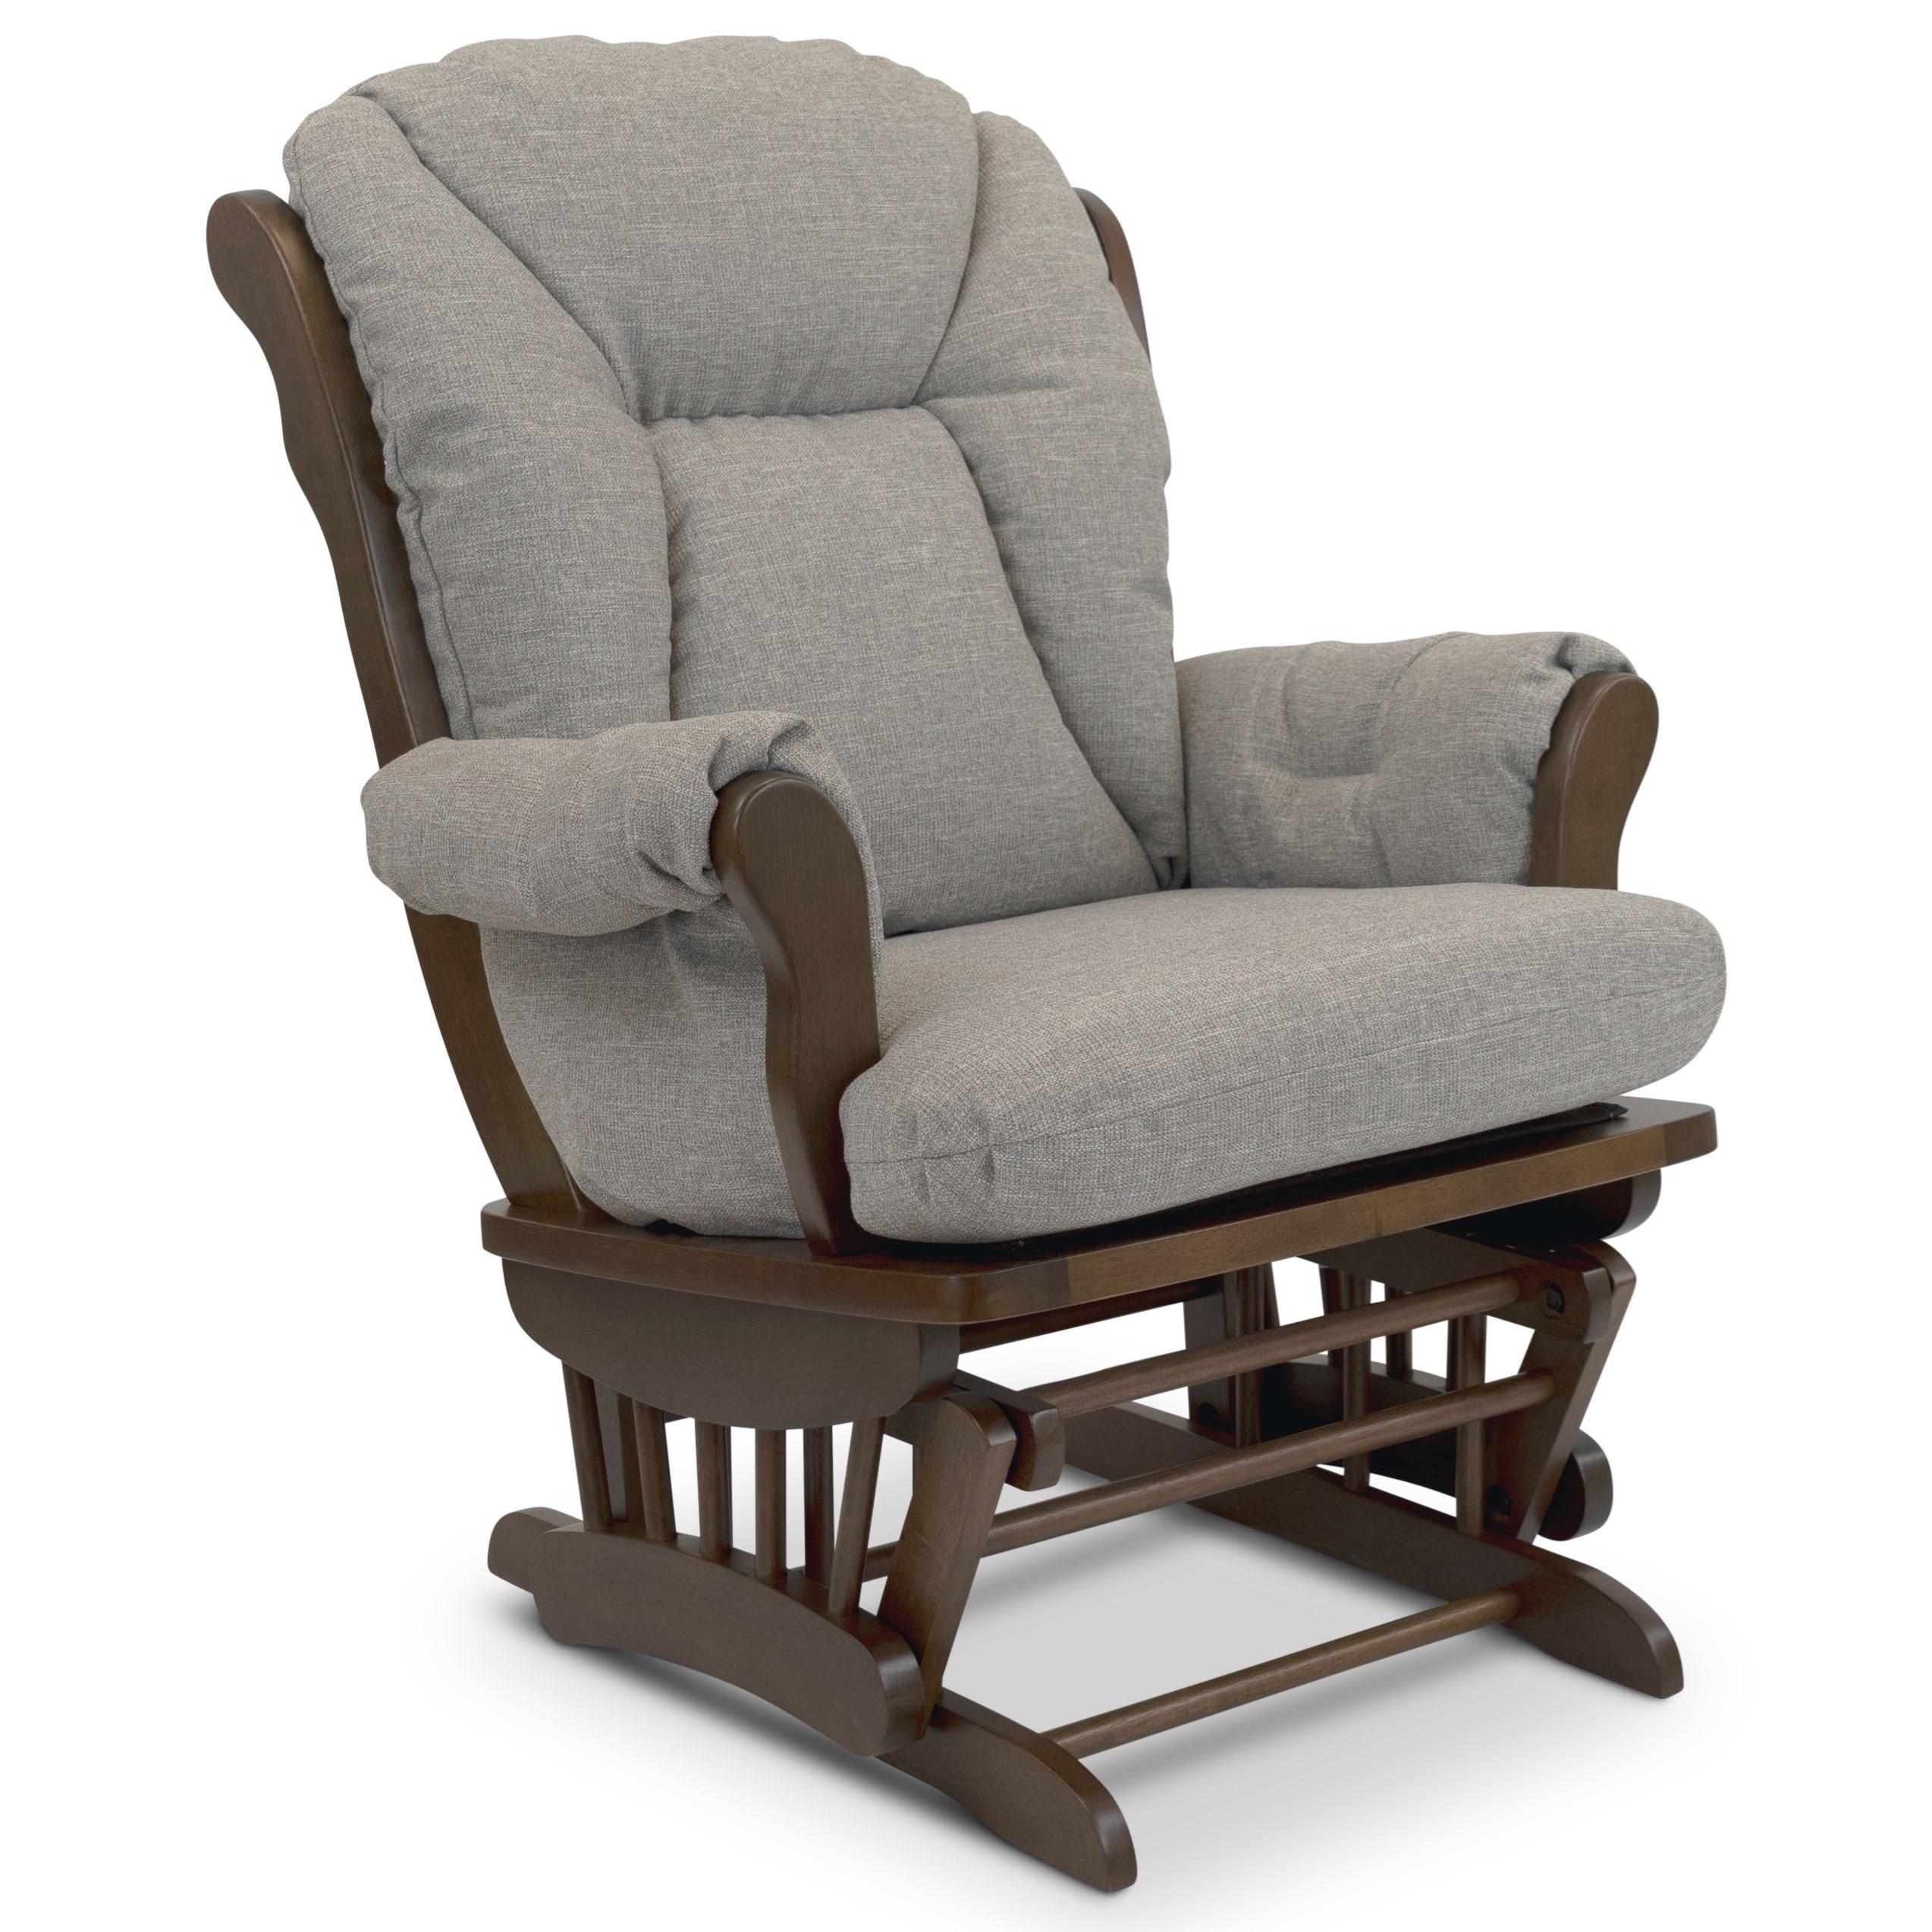 405 Glide Rocker by Best Home Furnishings at Walker's Furniture